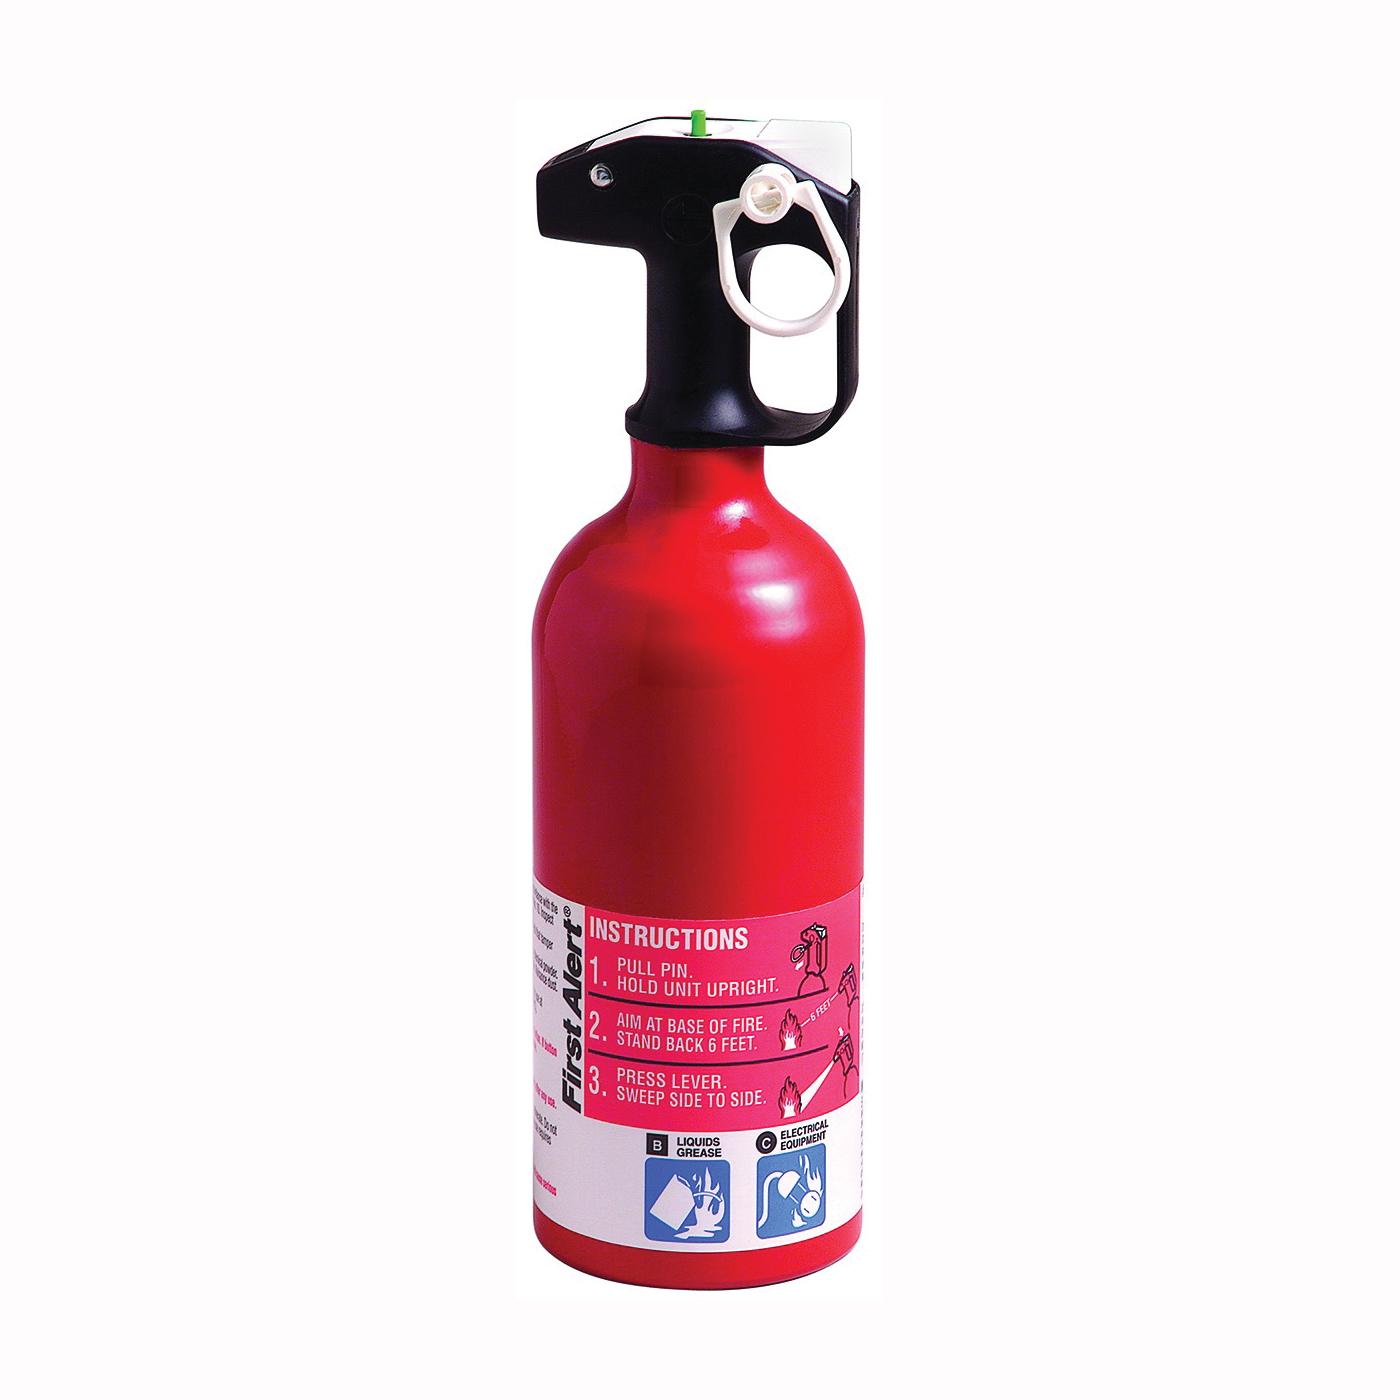 Picture of FIRST ALERT AUTO5 Fire Extinguisher, 1.4 lb Capacity, Sodium Bicarbonate, 5-B:C Class